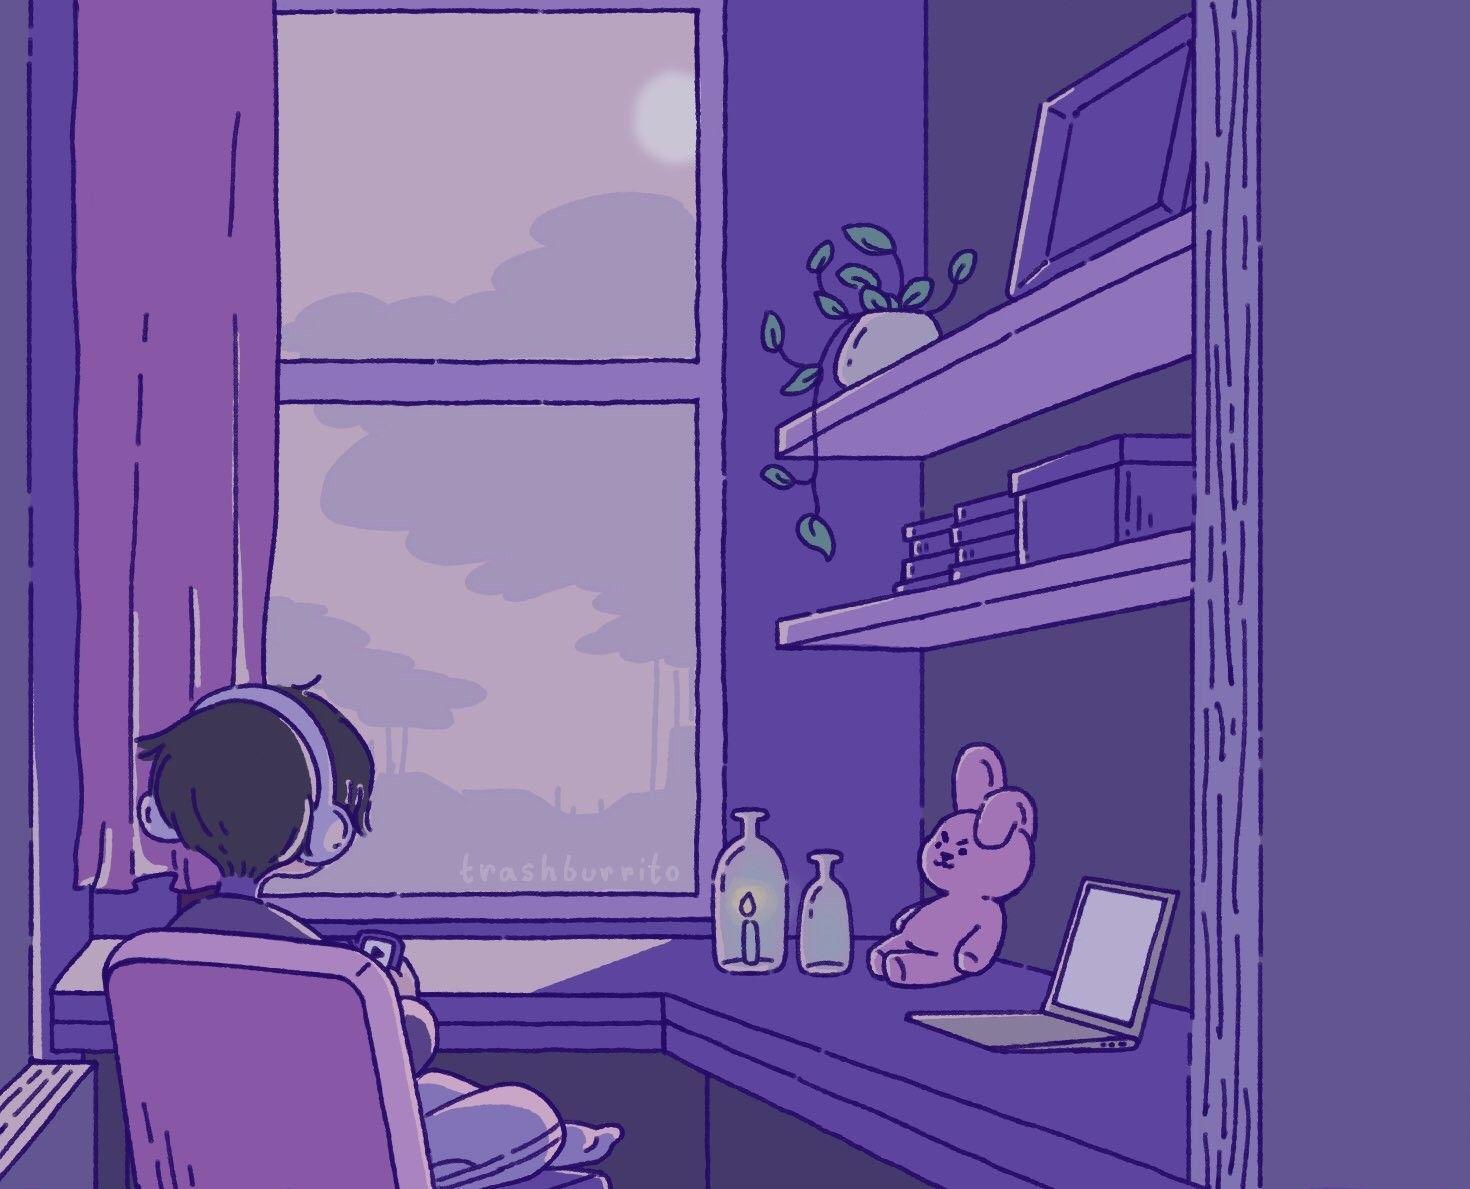 Twitter Com Trashburrito Aesthetic Anime Dark Purple Aesthetic Lavender Aesthetic Anime wallpaper aesthetic gif